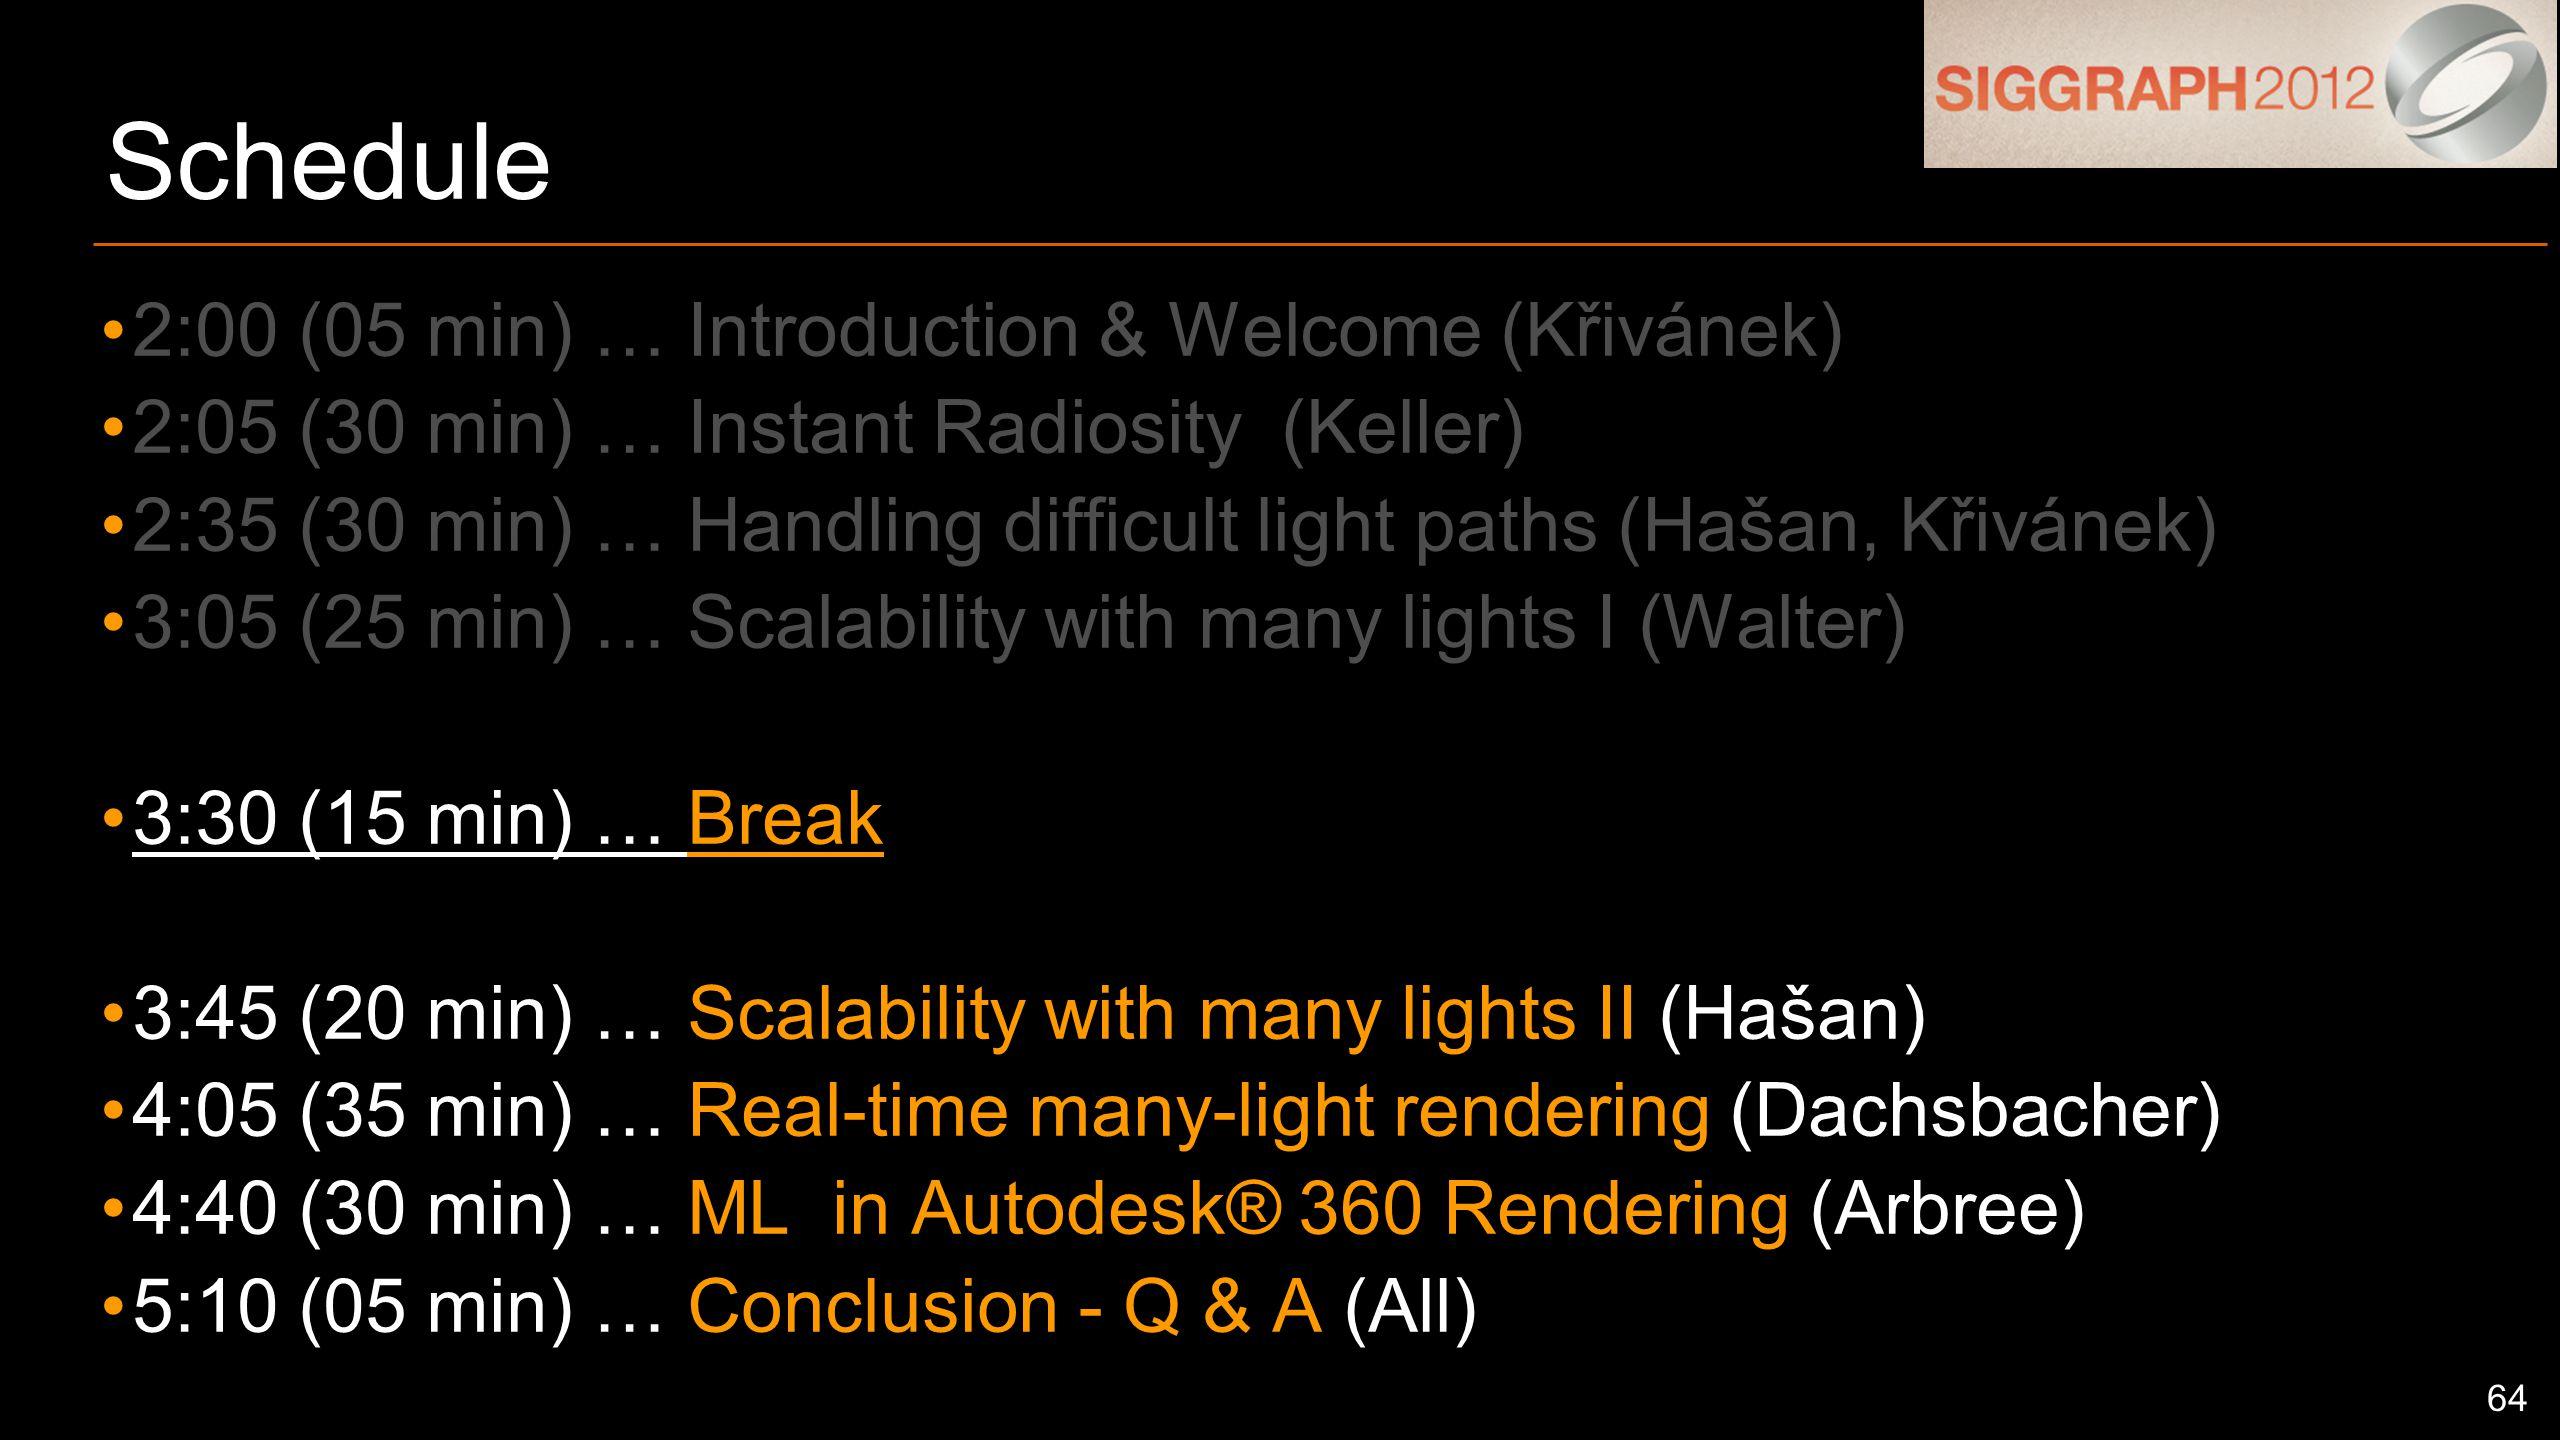 64 Schedule 2:00 (05 min) … Introduction & Welcome (Křivánek) 2:05 (30 min) … Instant Radiosity (Keller) 2:35 (30 min) … Handling difficult light paths (Hašan, Křivánek) 3:05 (25 min) … Scalability with many lights I (Walter) 3:30 (15 min) … Break 3:45 (20 min) … Scalability with many lights II (Hašan) 4:05 (35 min) … Real-time many-light rendering (Dachsbacher) 4:40 (30 min) … ML in Autodesk® 360 Rendering (Arbree) 5:10 (05 min) … Conclusion - Q & A (All)